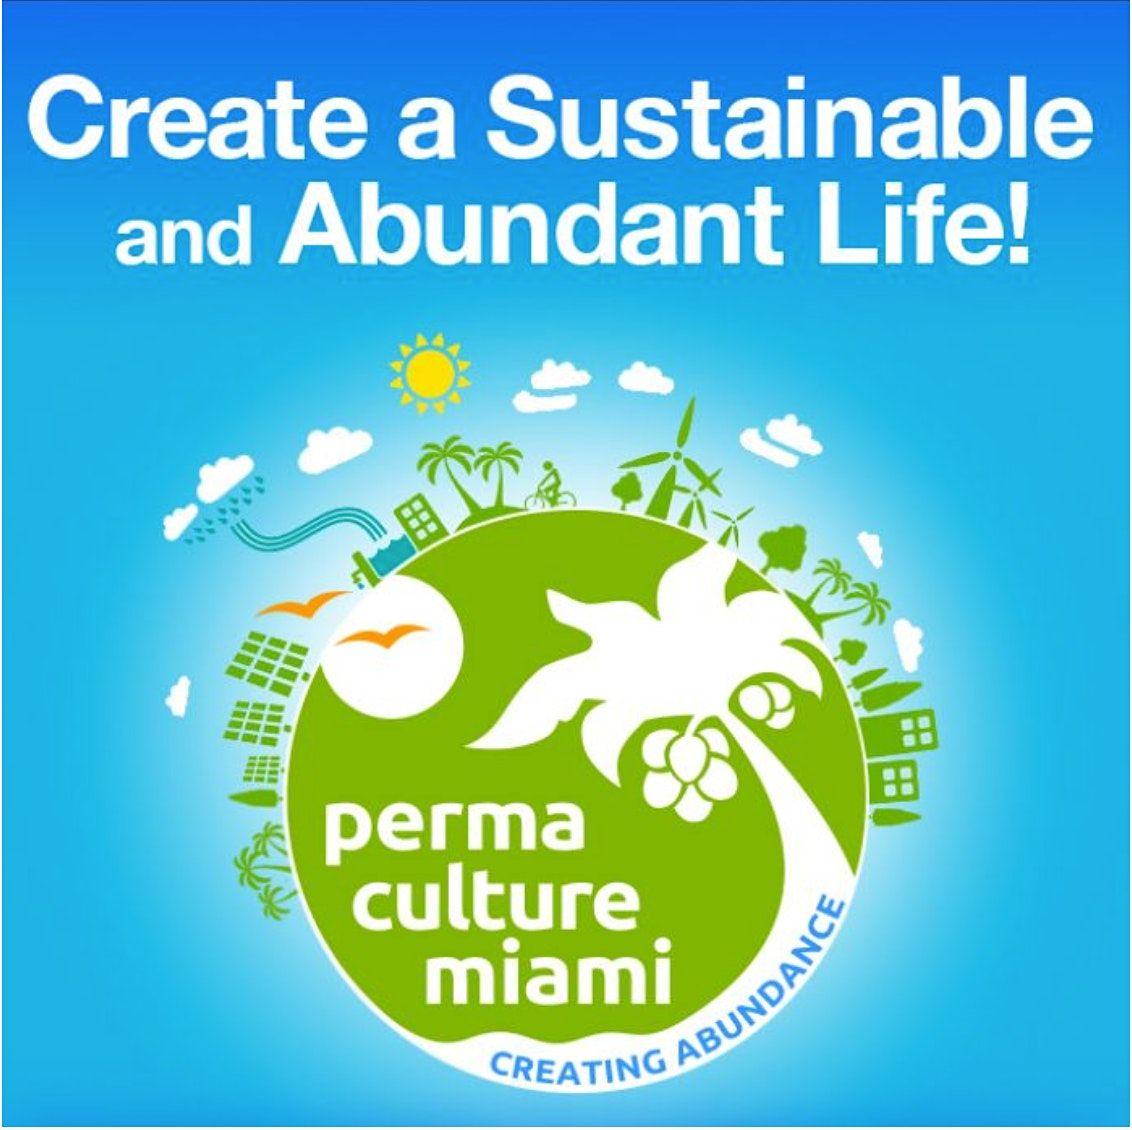 Permaculture Design Course Miami South Florida